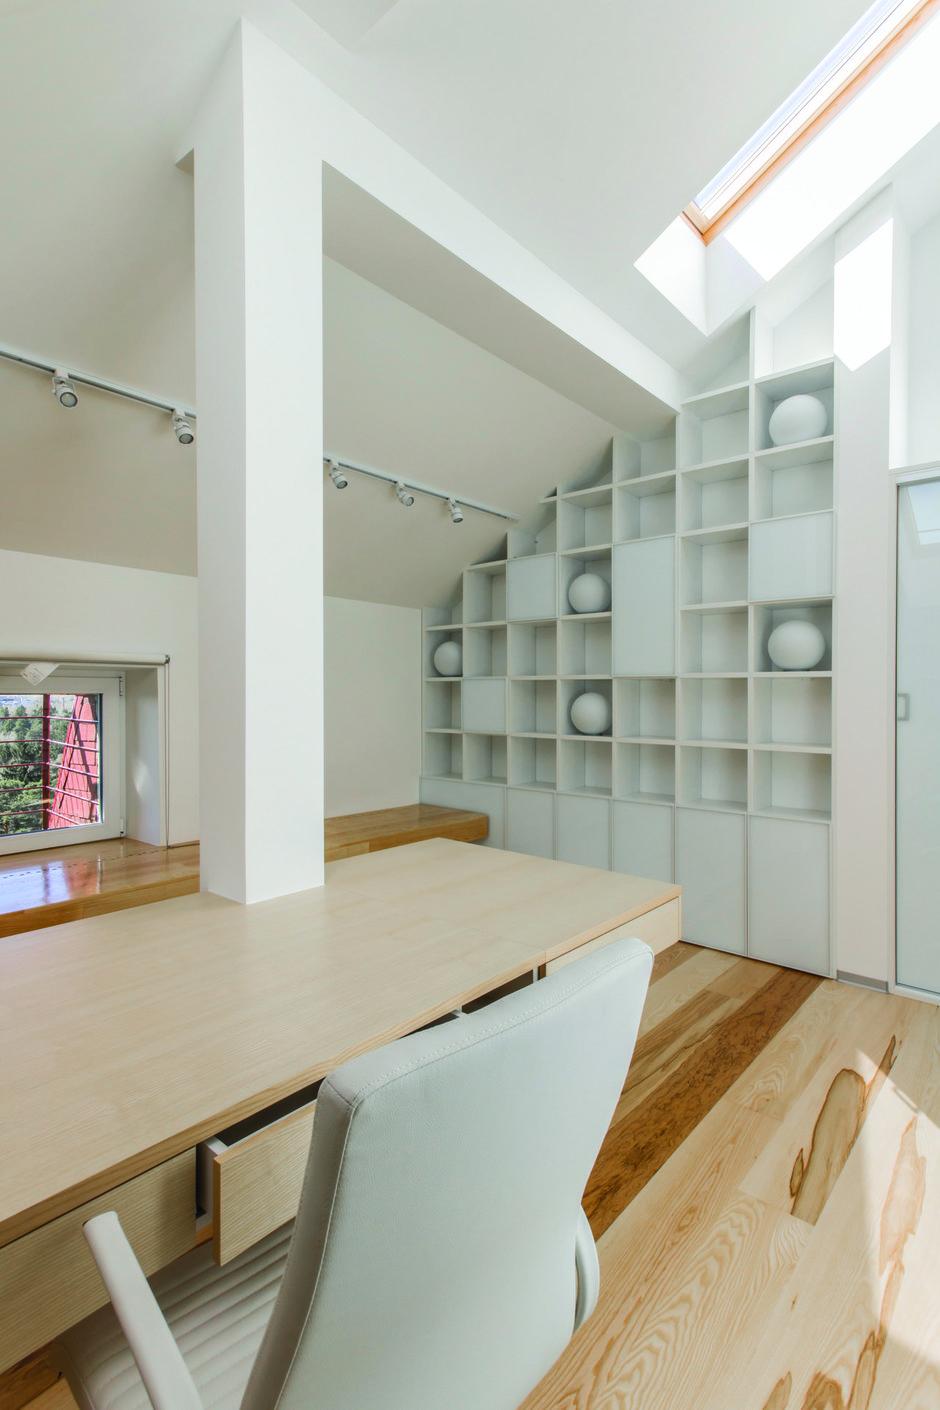 Фотография: Офис в стиле Лофт, Квартира, BoConcept, Дома и квартиры, Белый, IKEA, Проект недели, Мансарда – фото на InMyRoom.ru